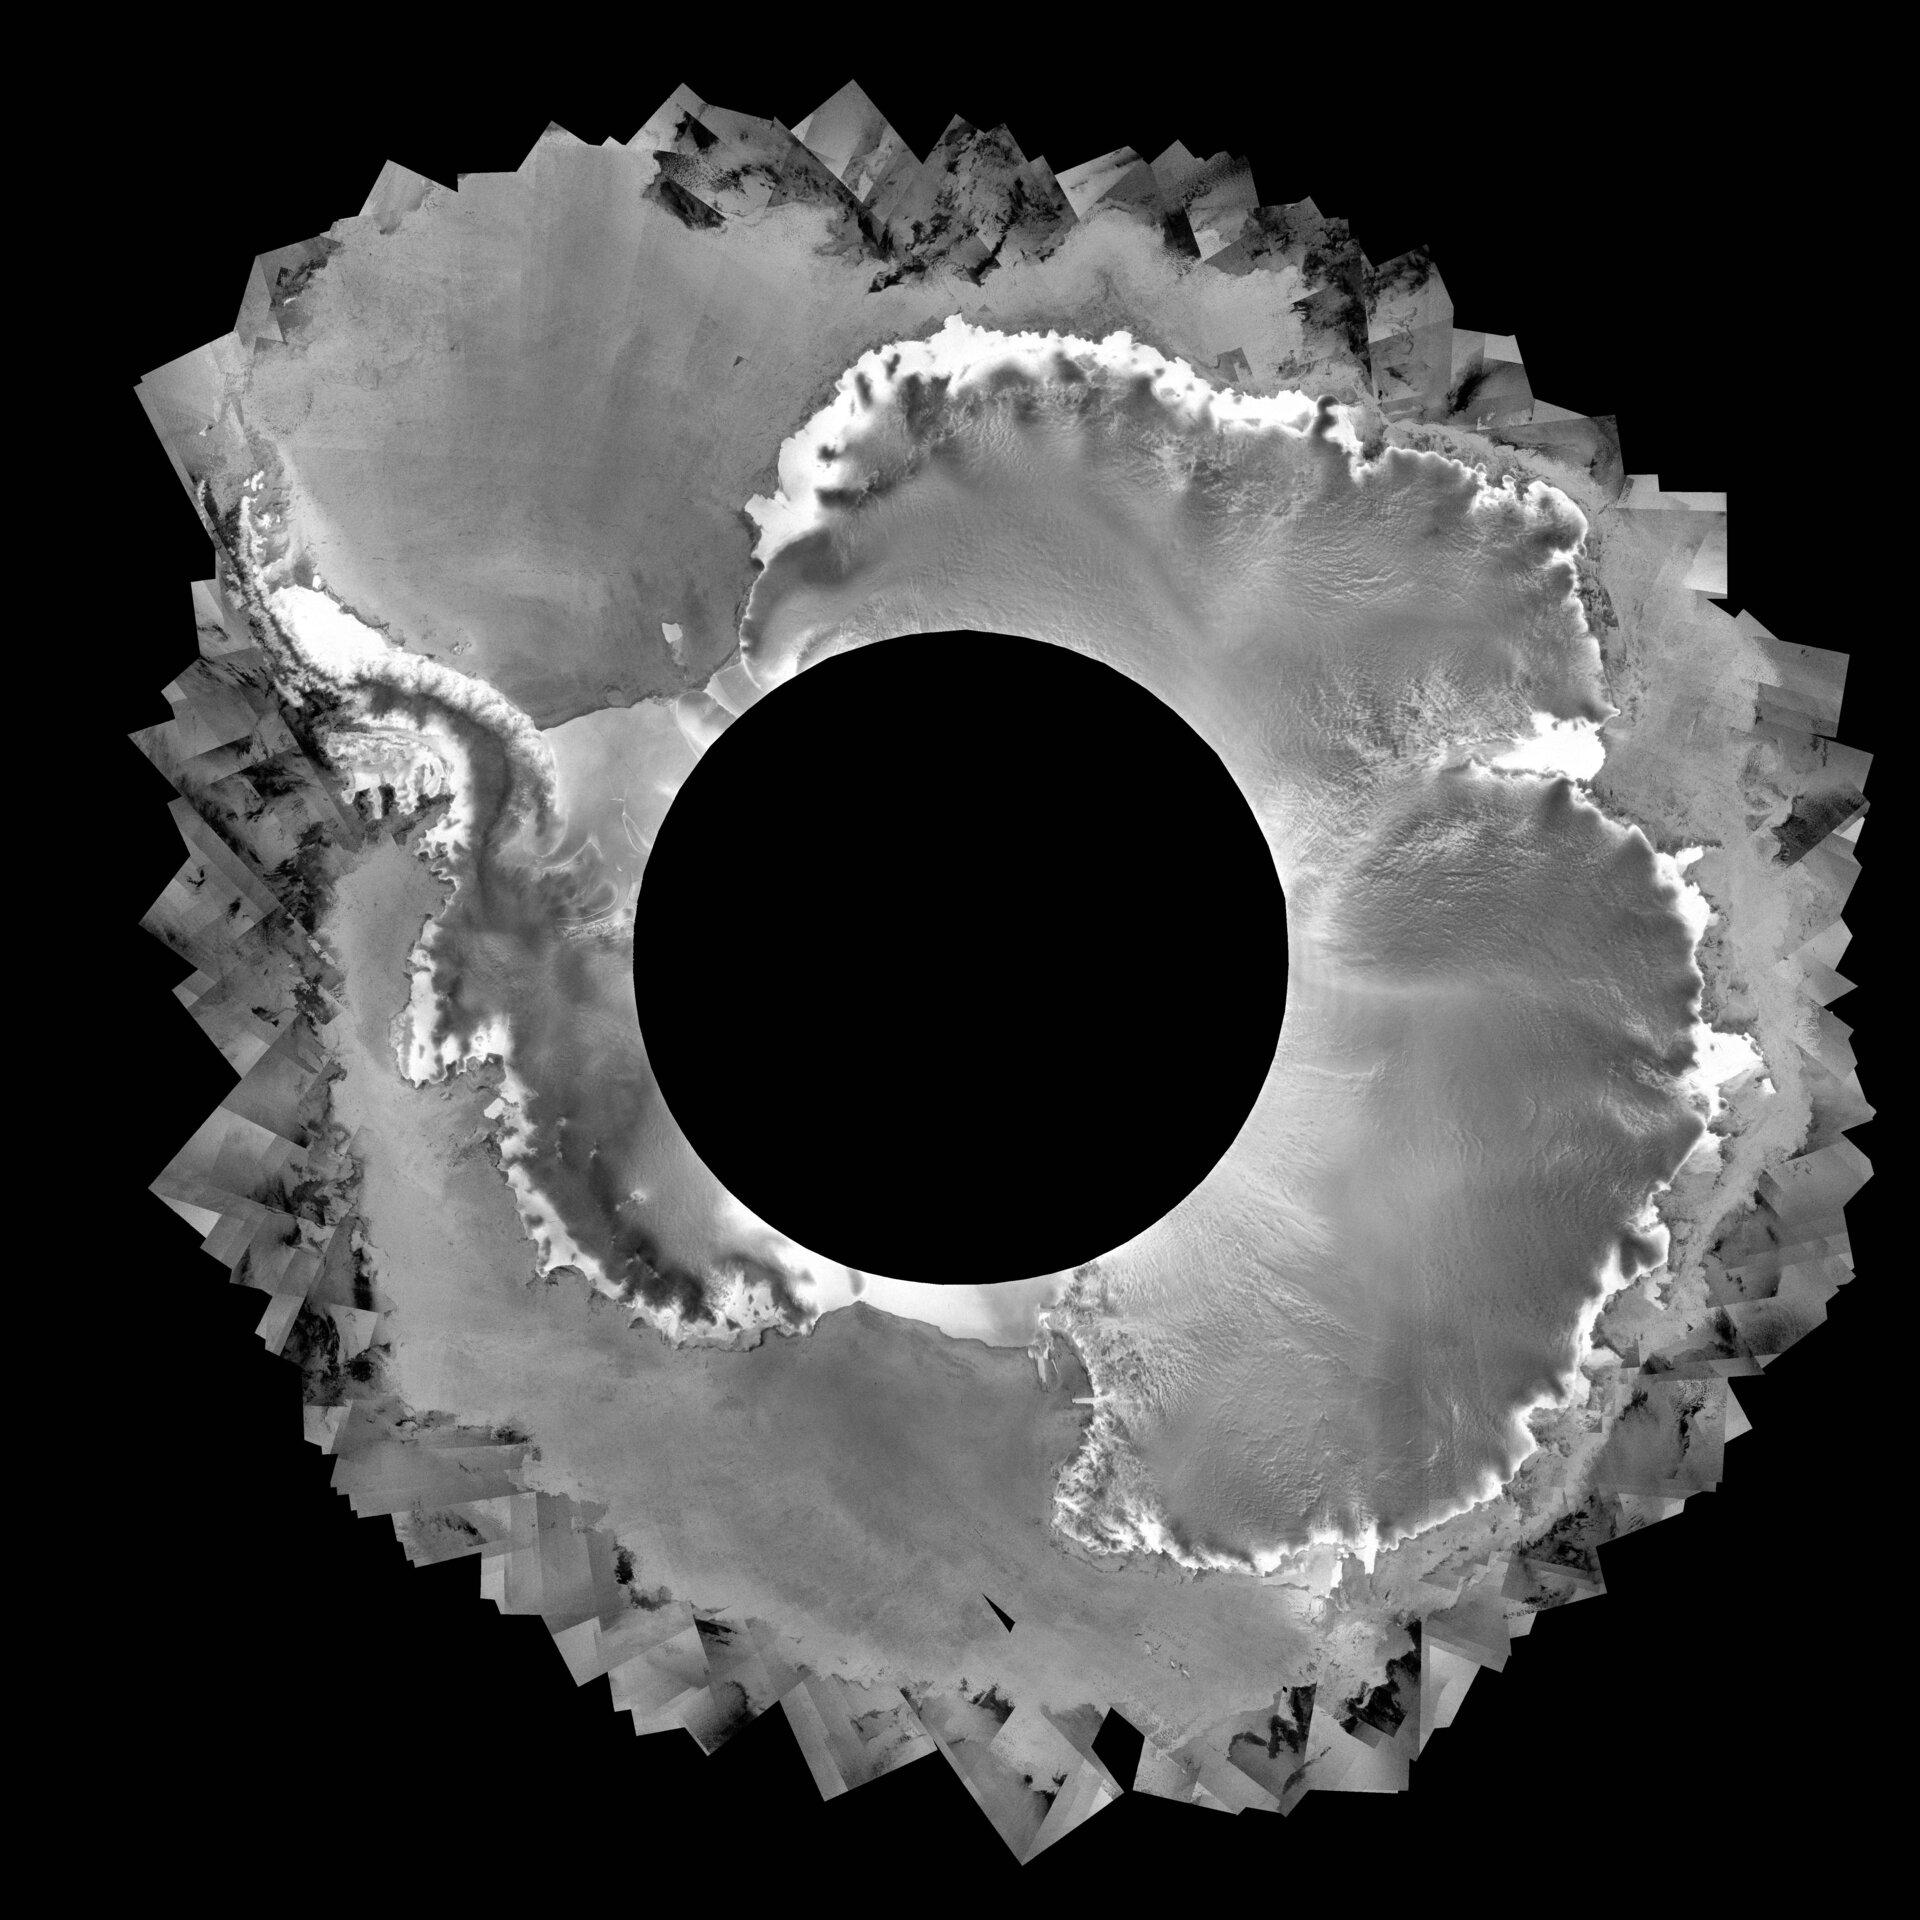 Envisat_GMM_mosaic_of_Antarctica_-_April_and_May_2004_pillars.jpg